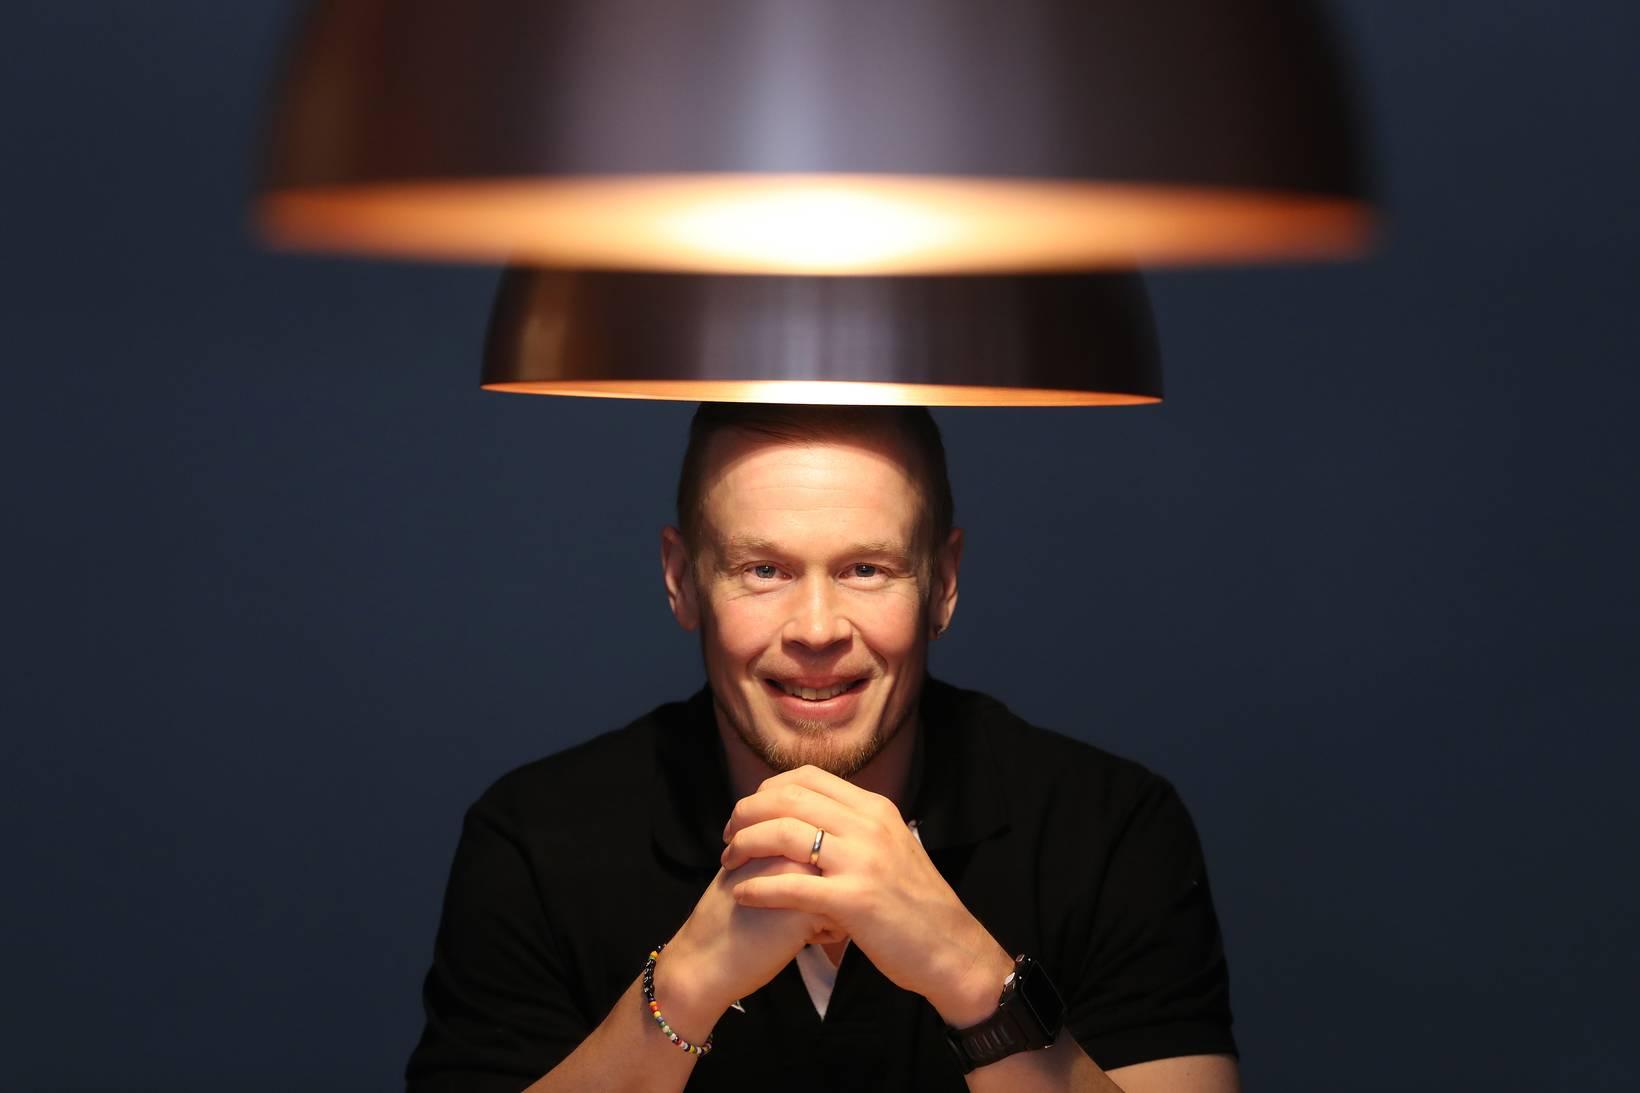 Ville Aaltonen